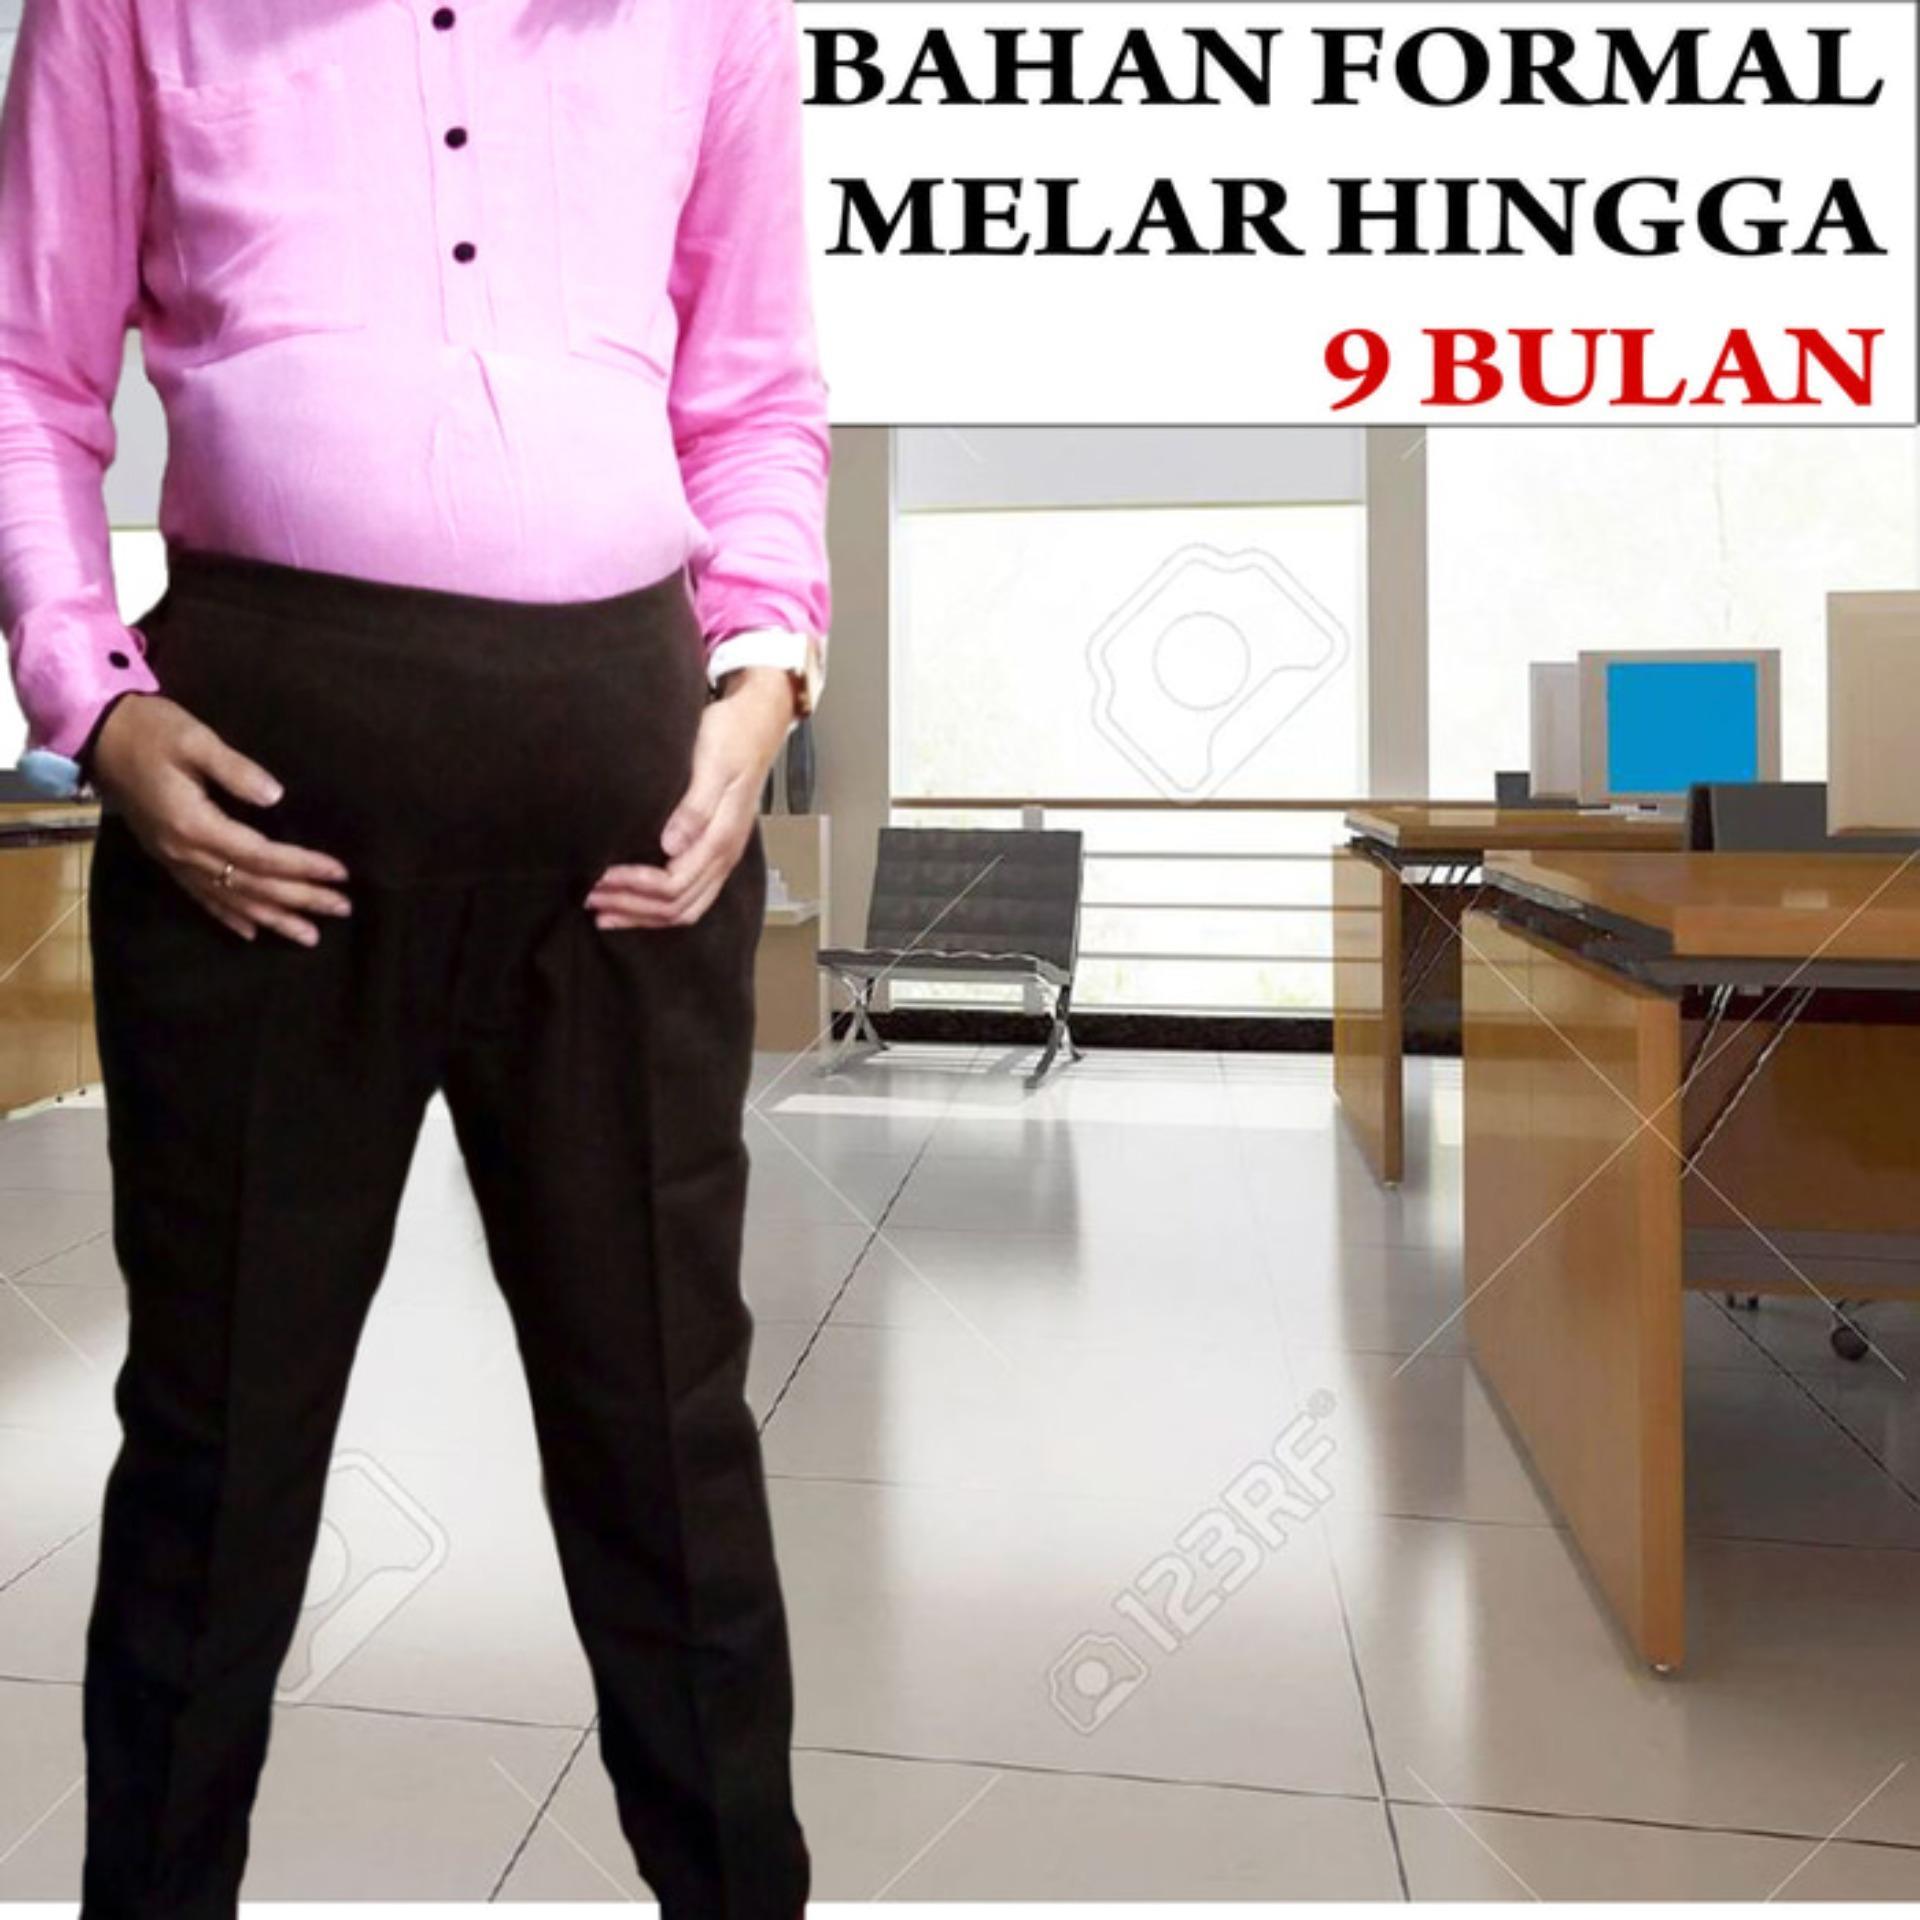 Celana Hamil Kerja / Formal / Kantor Kualitas Bagus